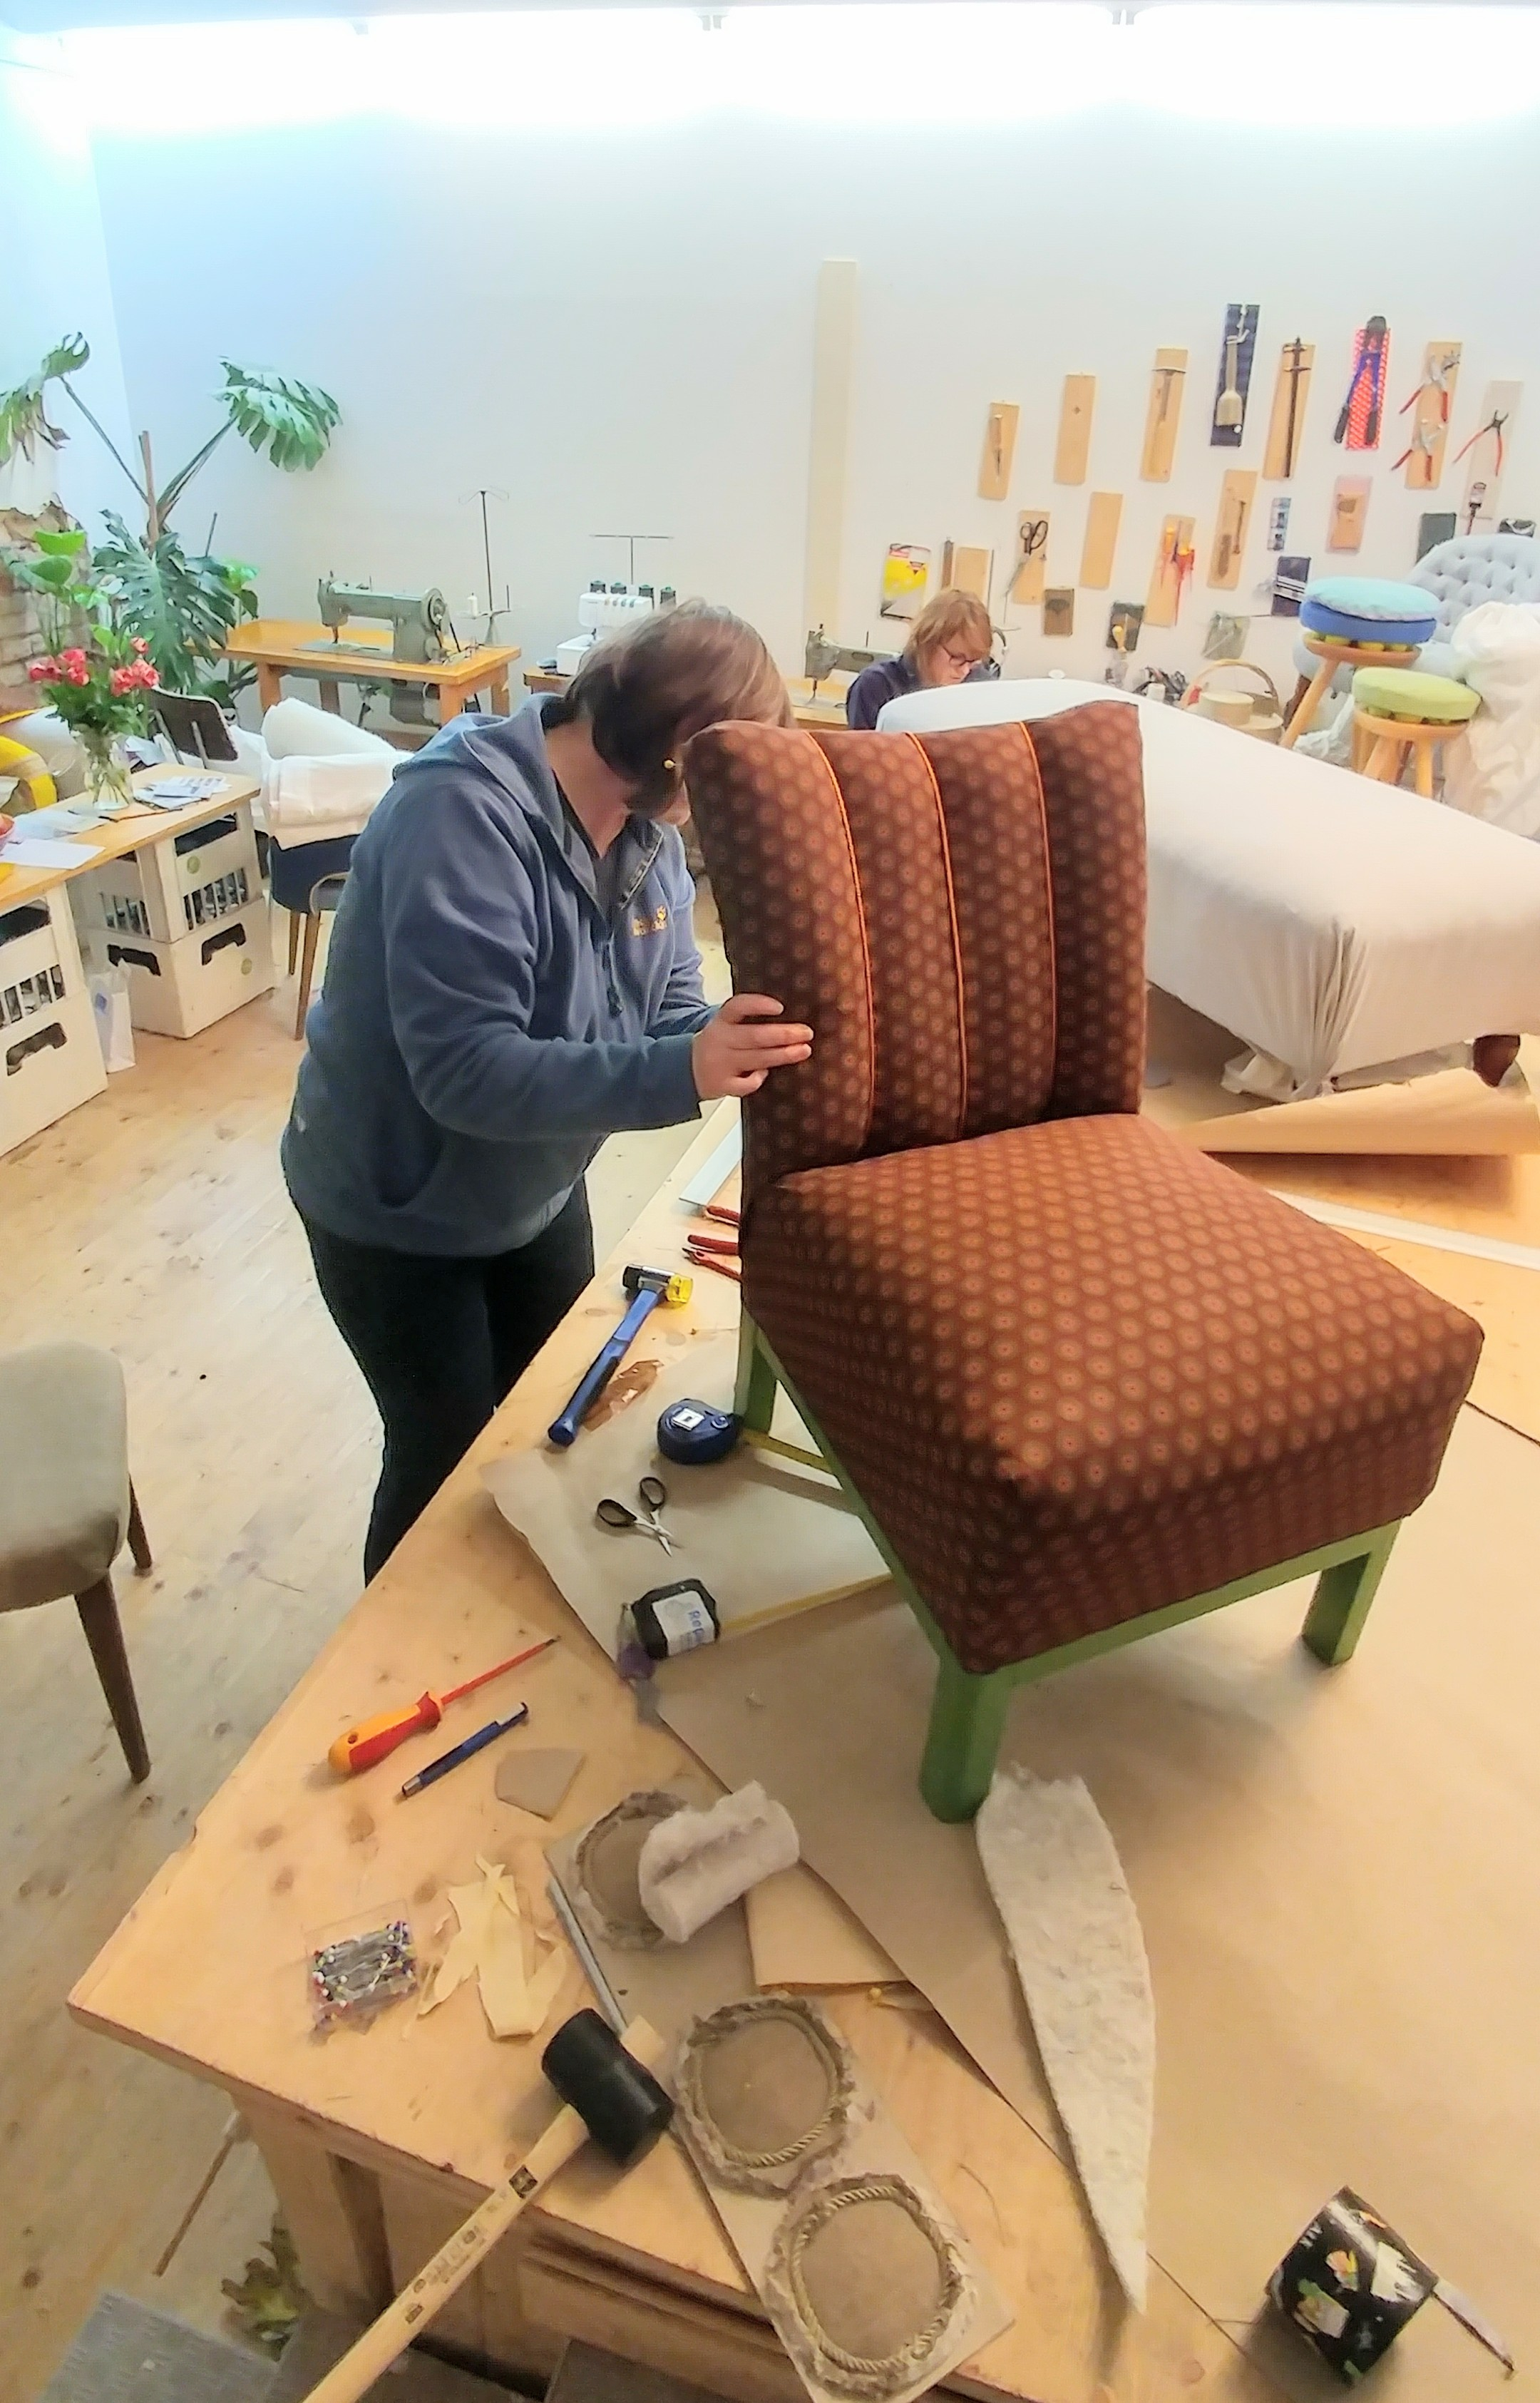 Stuhl rckenlehne selbst beziehen simple alle sthle bnke with stuhl rckenlehne selbst beziehen - Stuhle selbst beziehen ...